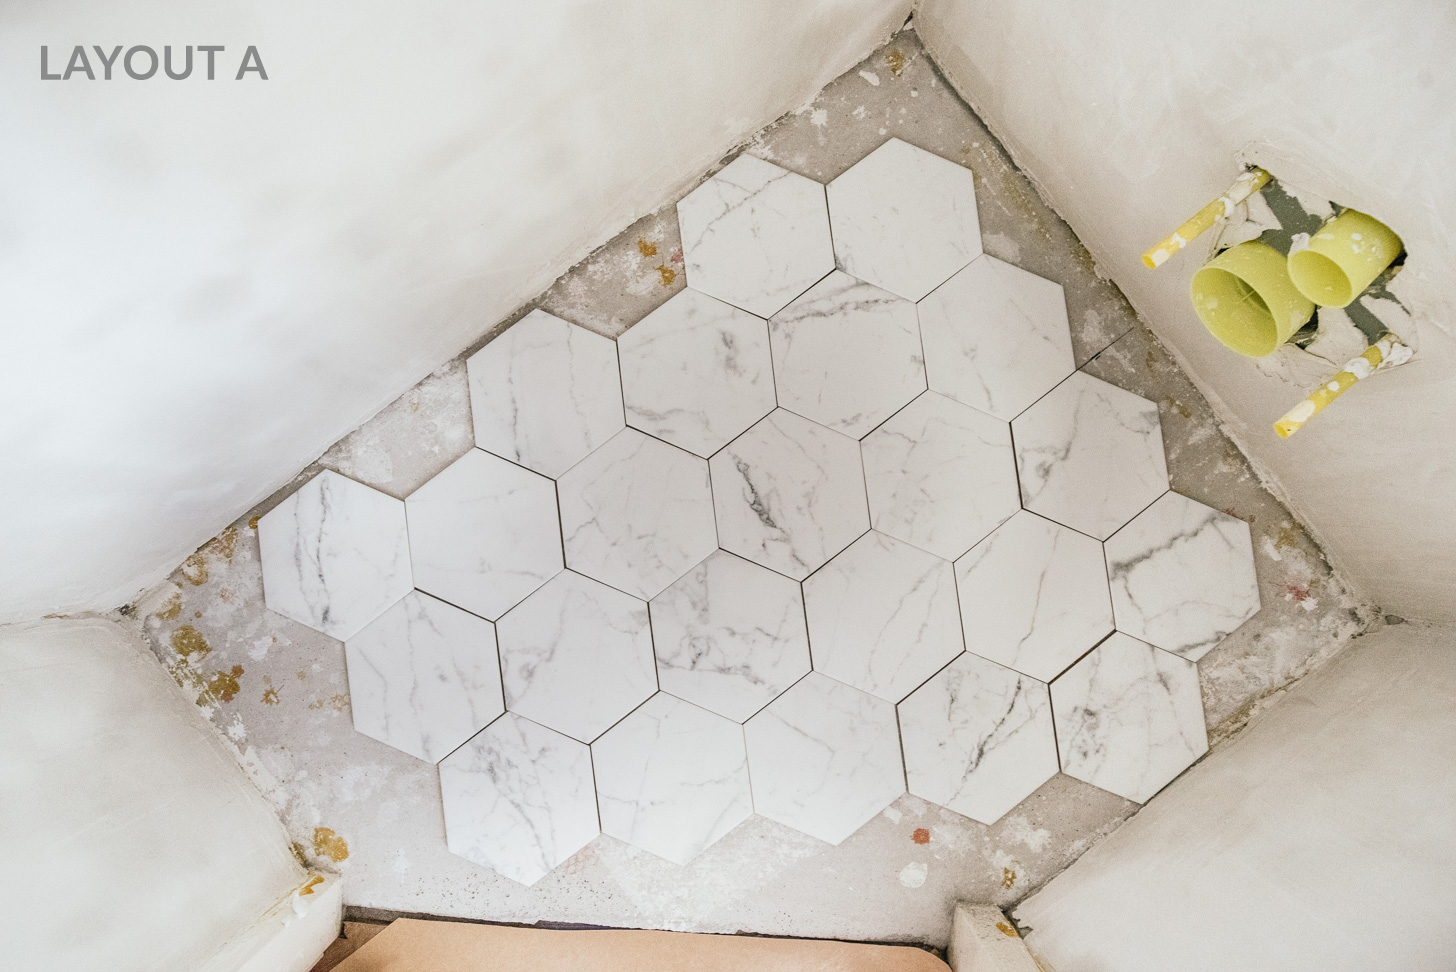 Tegels Leggen Badkamer : Hoe leg je hexagon tegels? honingraat vloer a cup of life